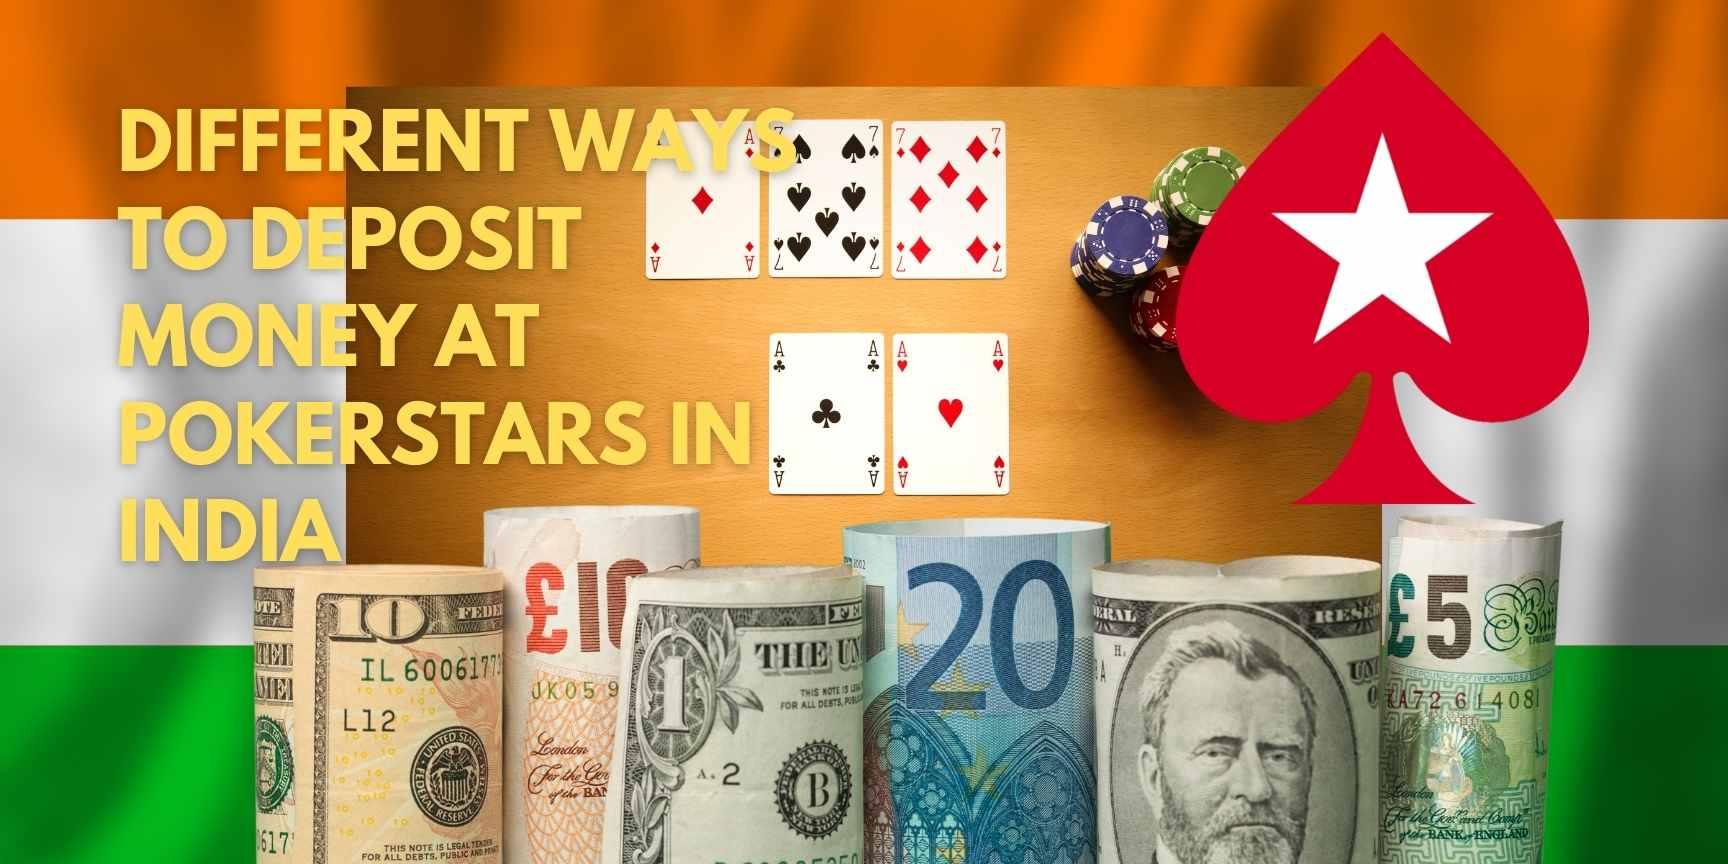 Different ways to deposit money at PokerStars in India